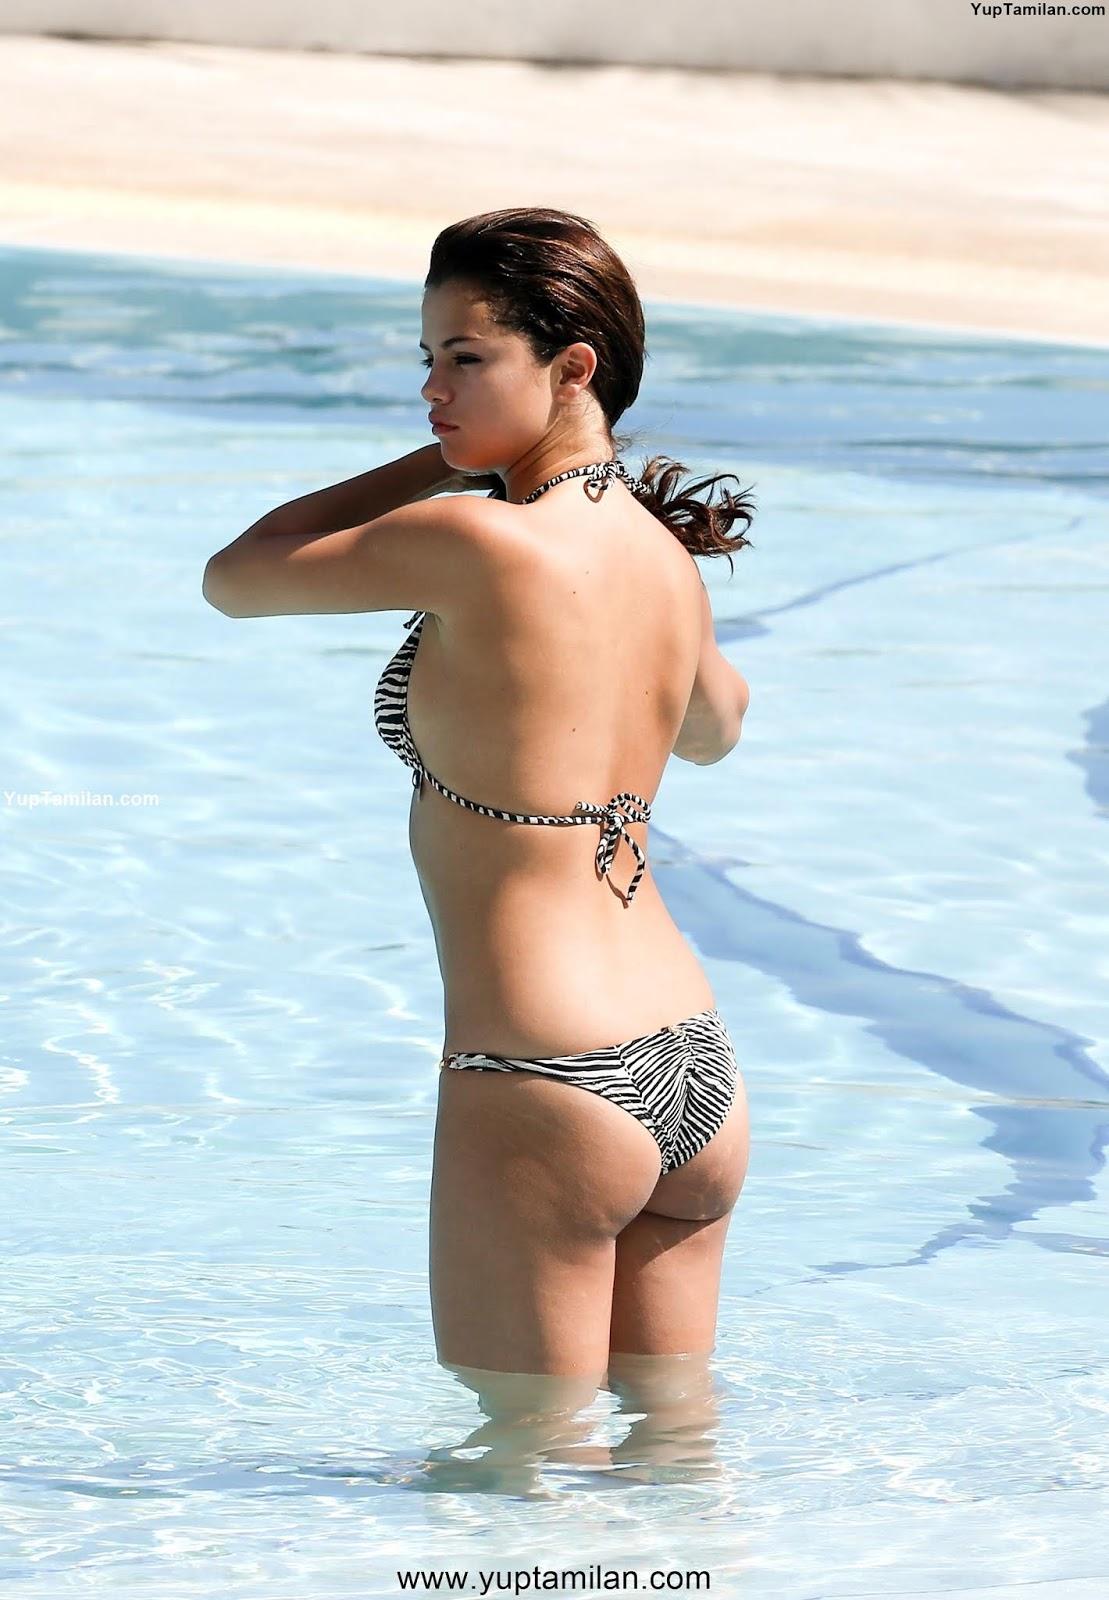 Selena Gomez Sexy lingrie & Swimsuit Images